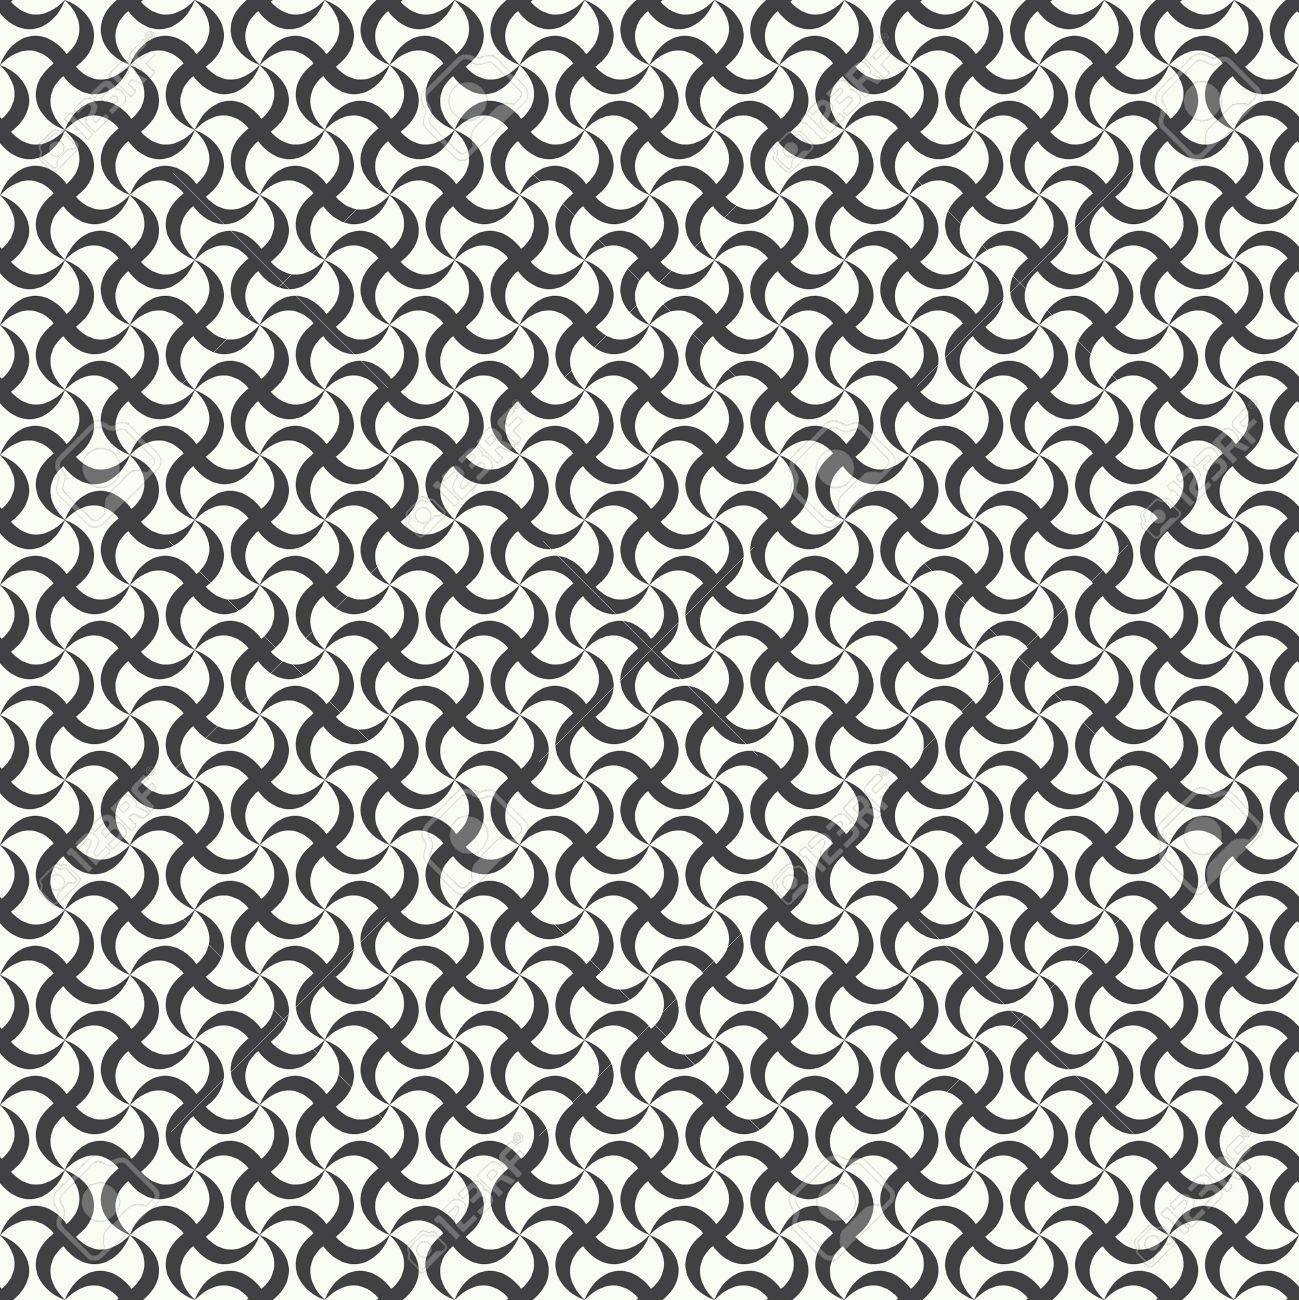 Seamless Pattern Abstract Textured Background Modern Stylish